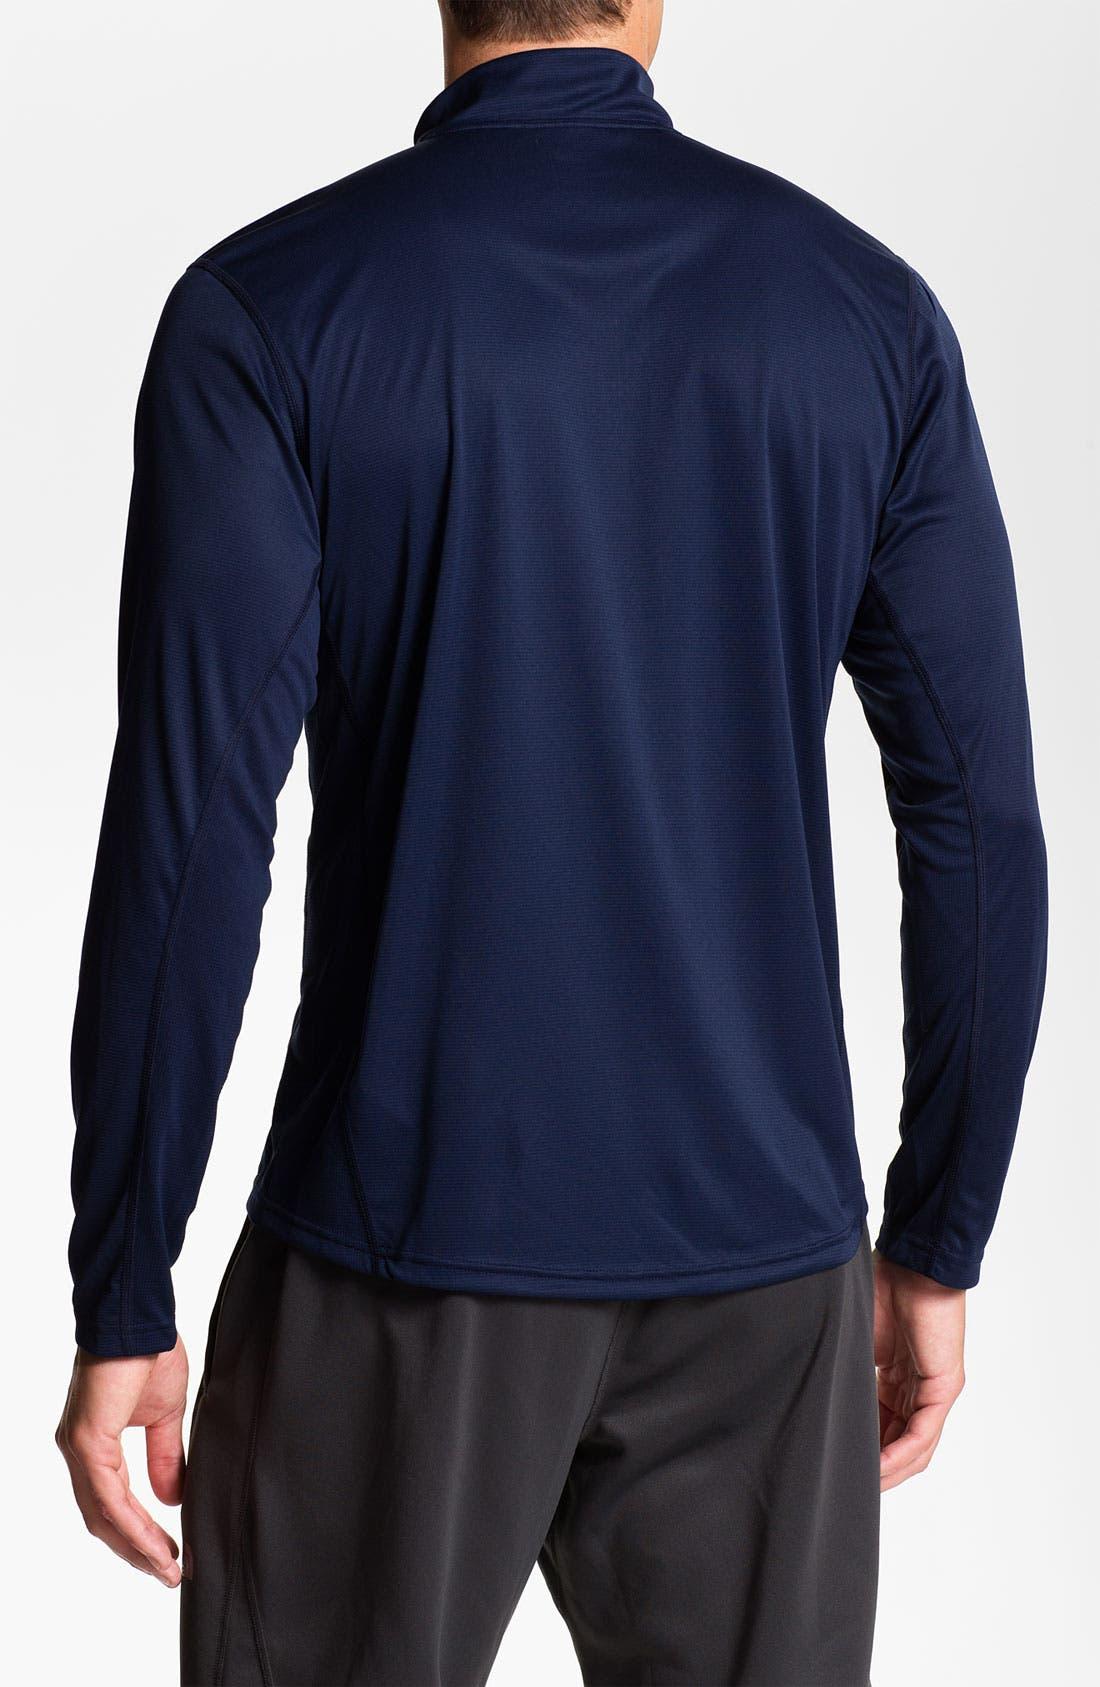 Alternate Image 2  - The North Face 'Flex' Quarter Zip Jacket